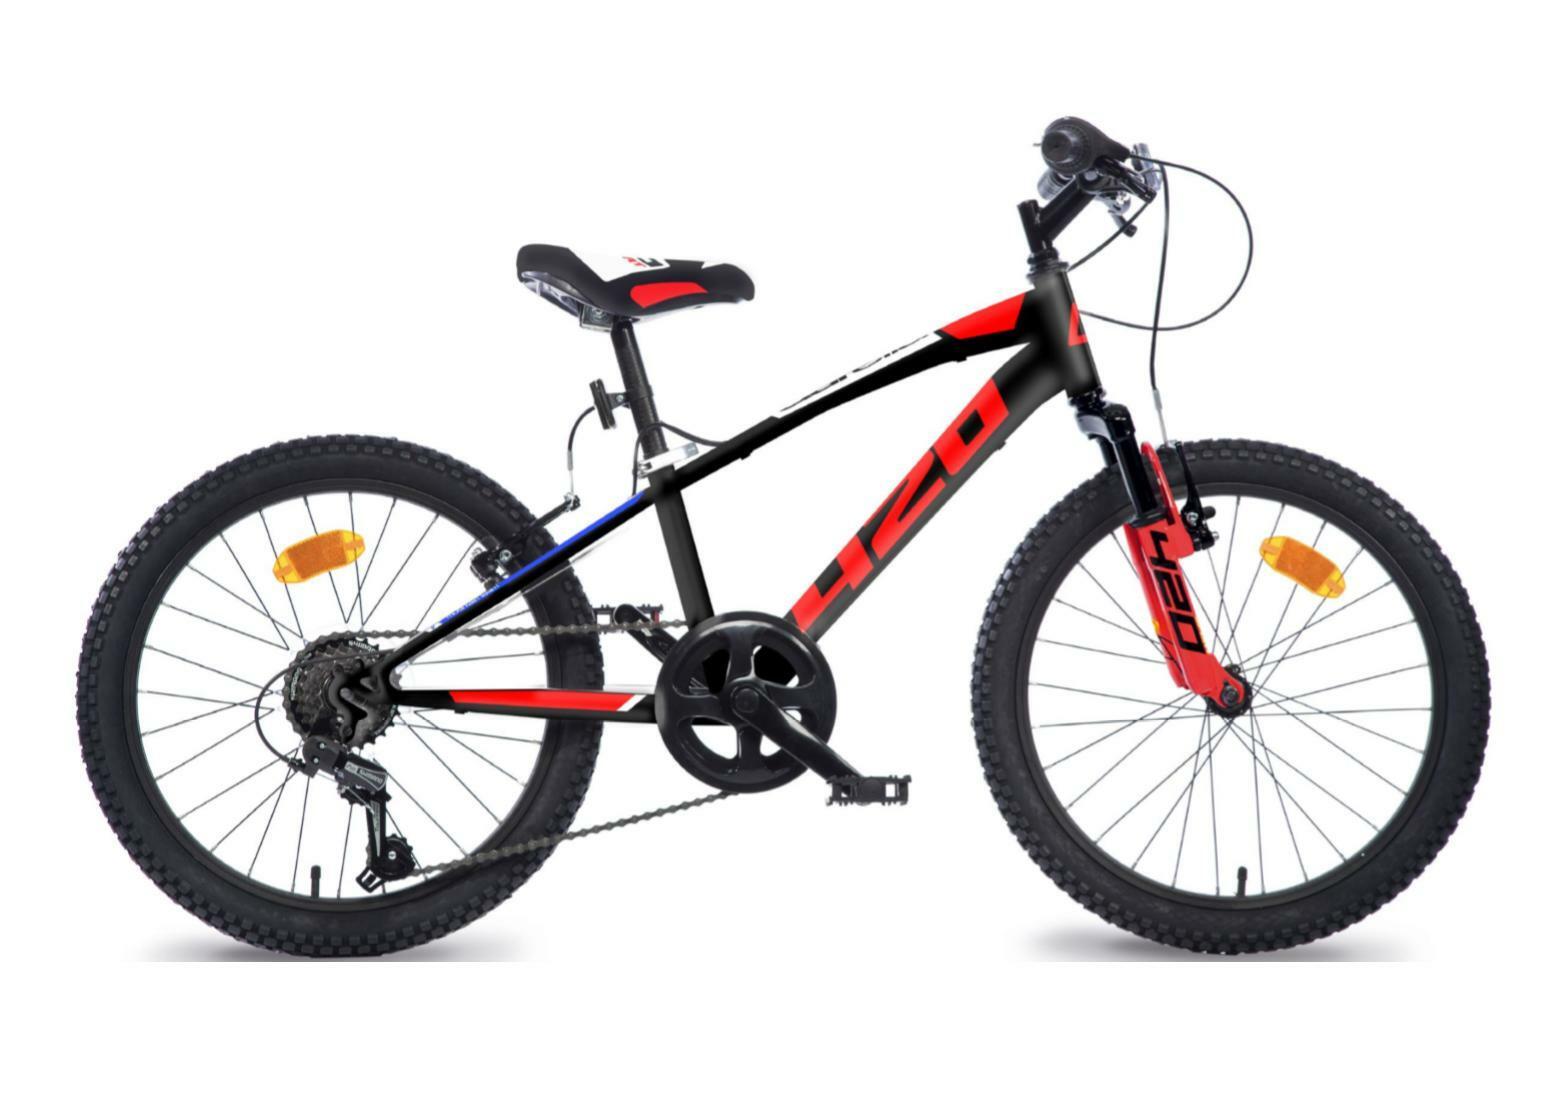 dino bikes dino bikes bicicletta aurelia 420 sport 20 pollici